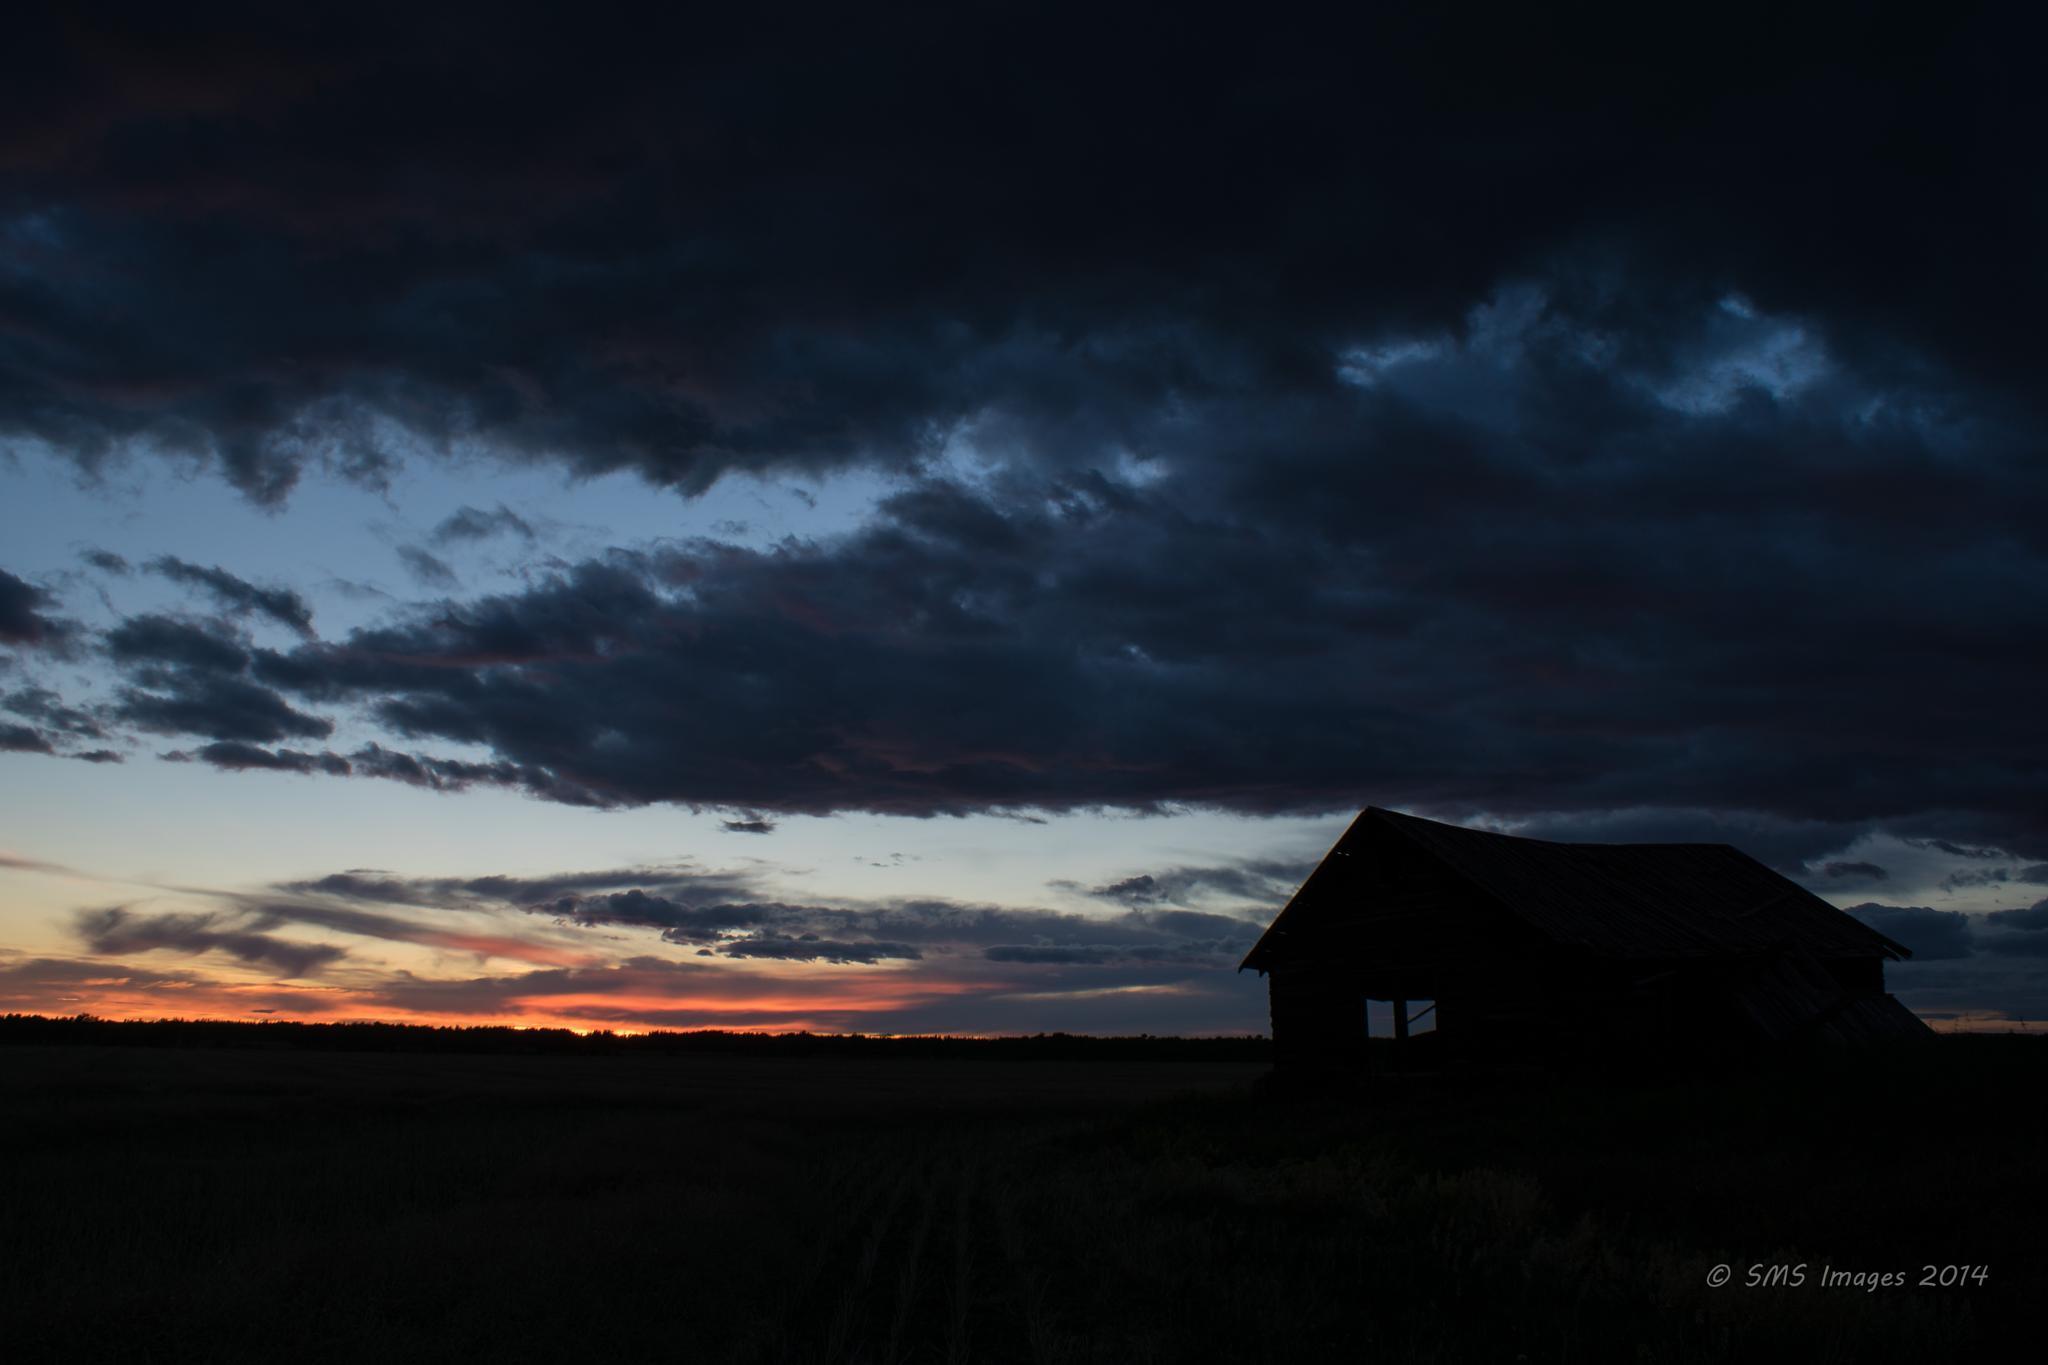 Evening With a Farmhouse 7 by SteveMumert